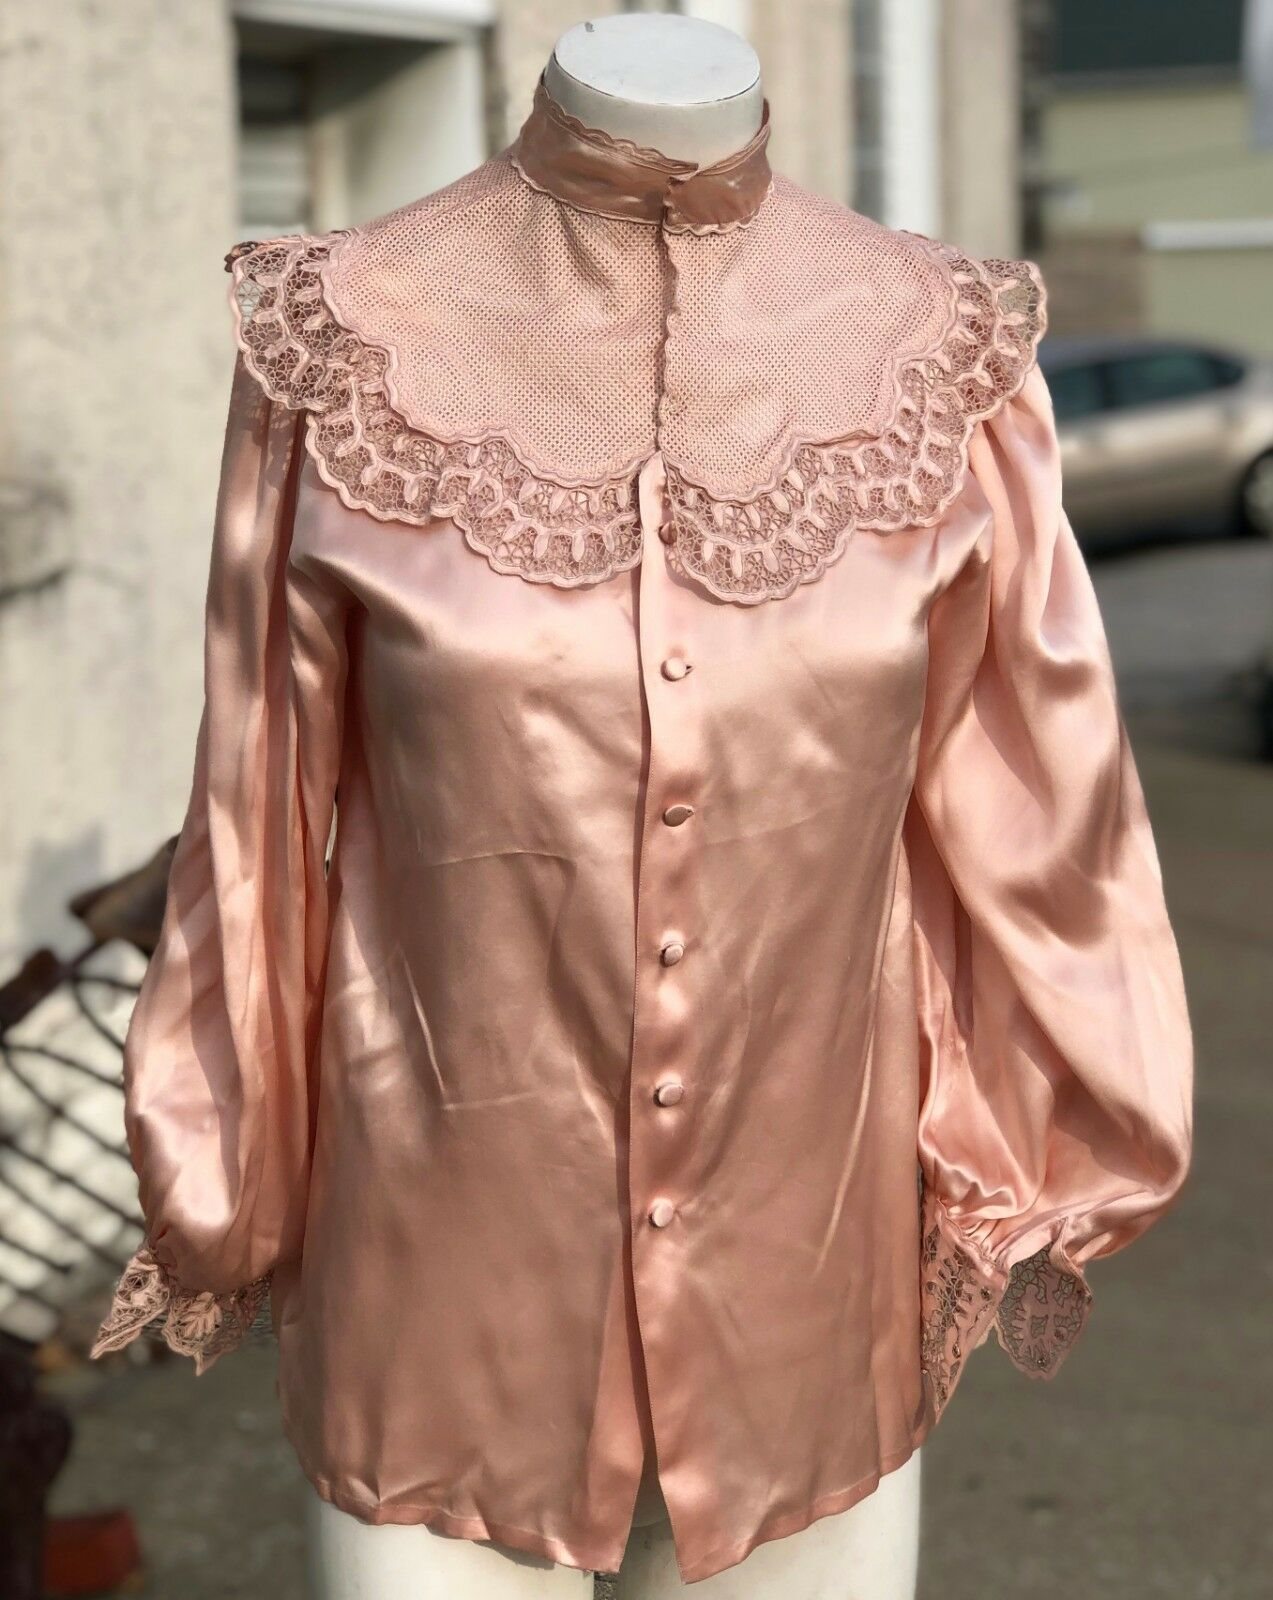 Vintage 1950 Retro Hand Made Rosa Silk & Lace Snap Up Choker Top Blouse Shirt M